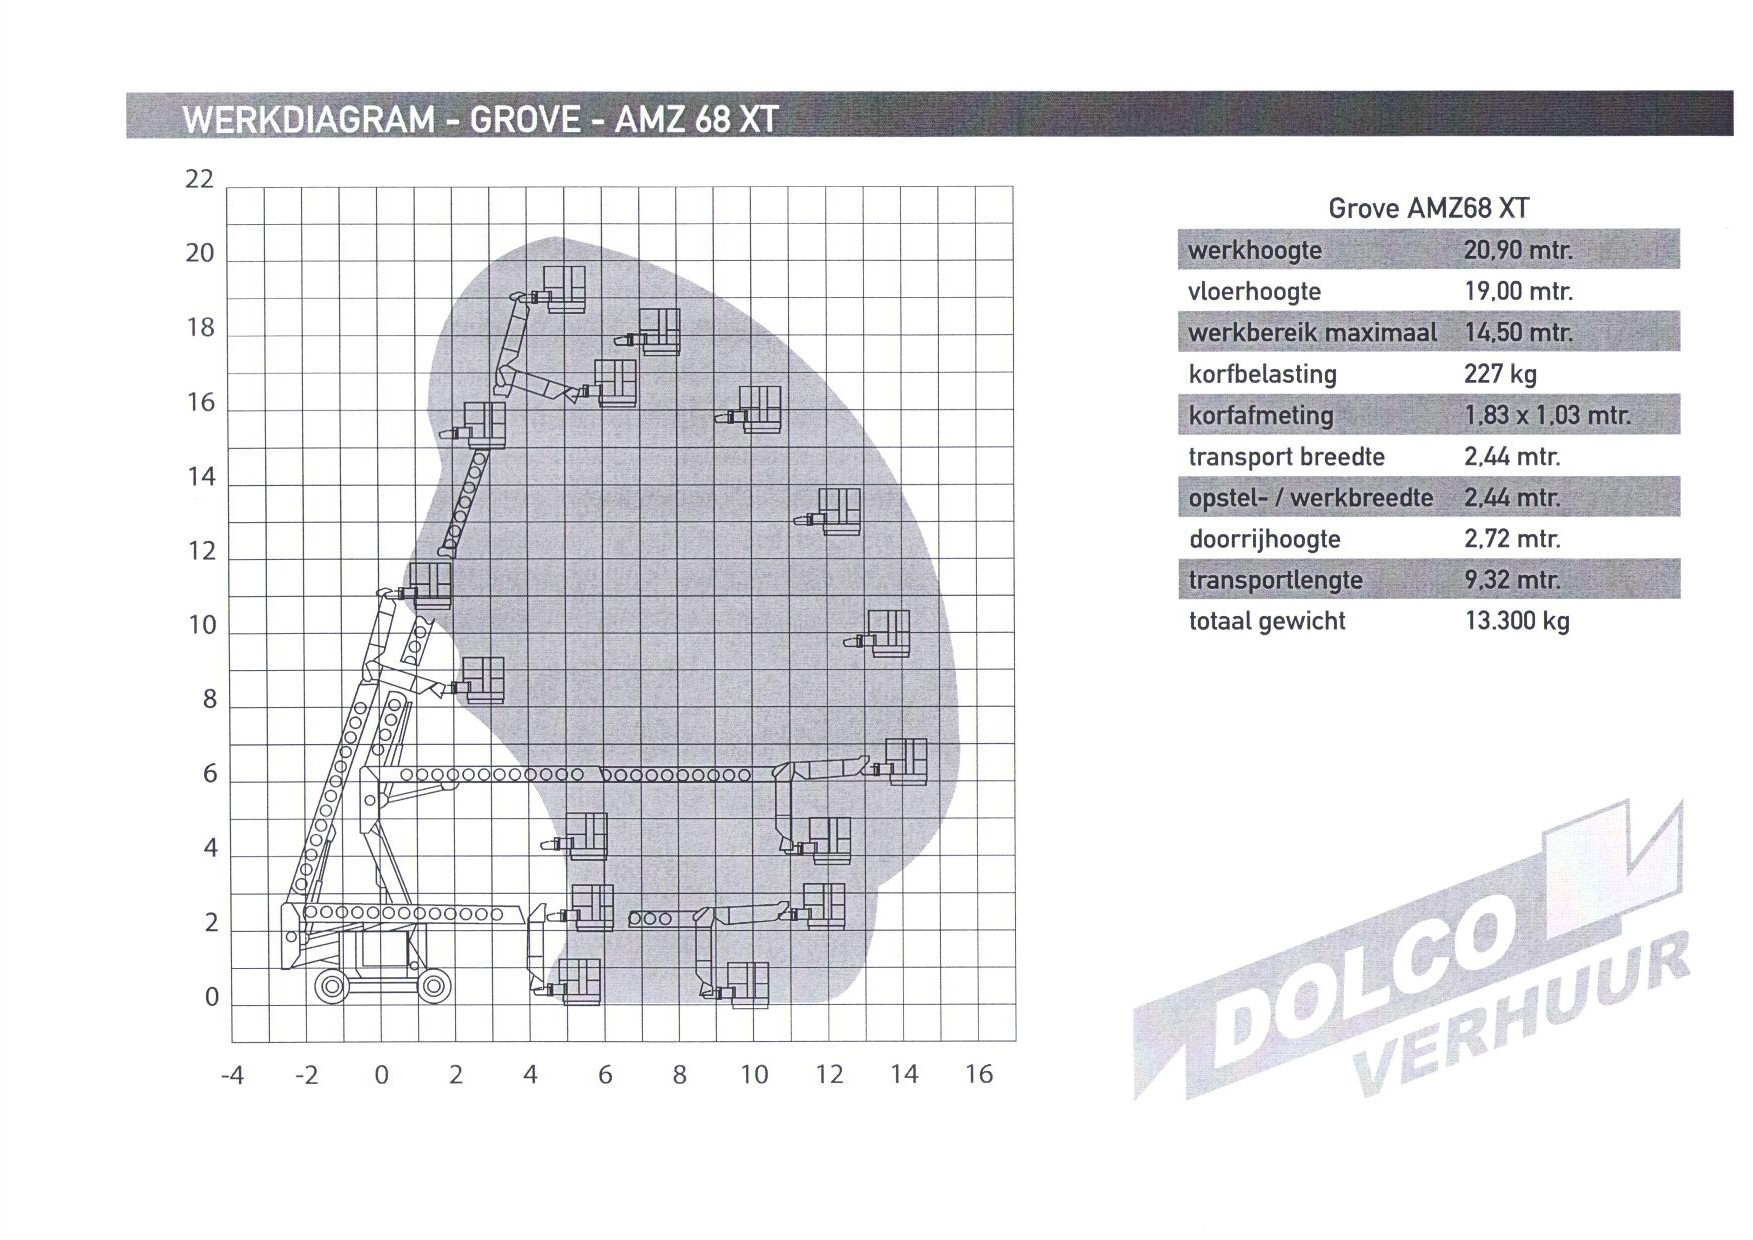 Diagram-Grove-AMZ68XT